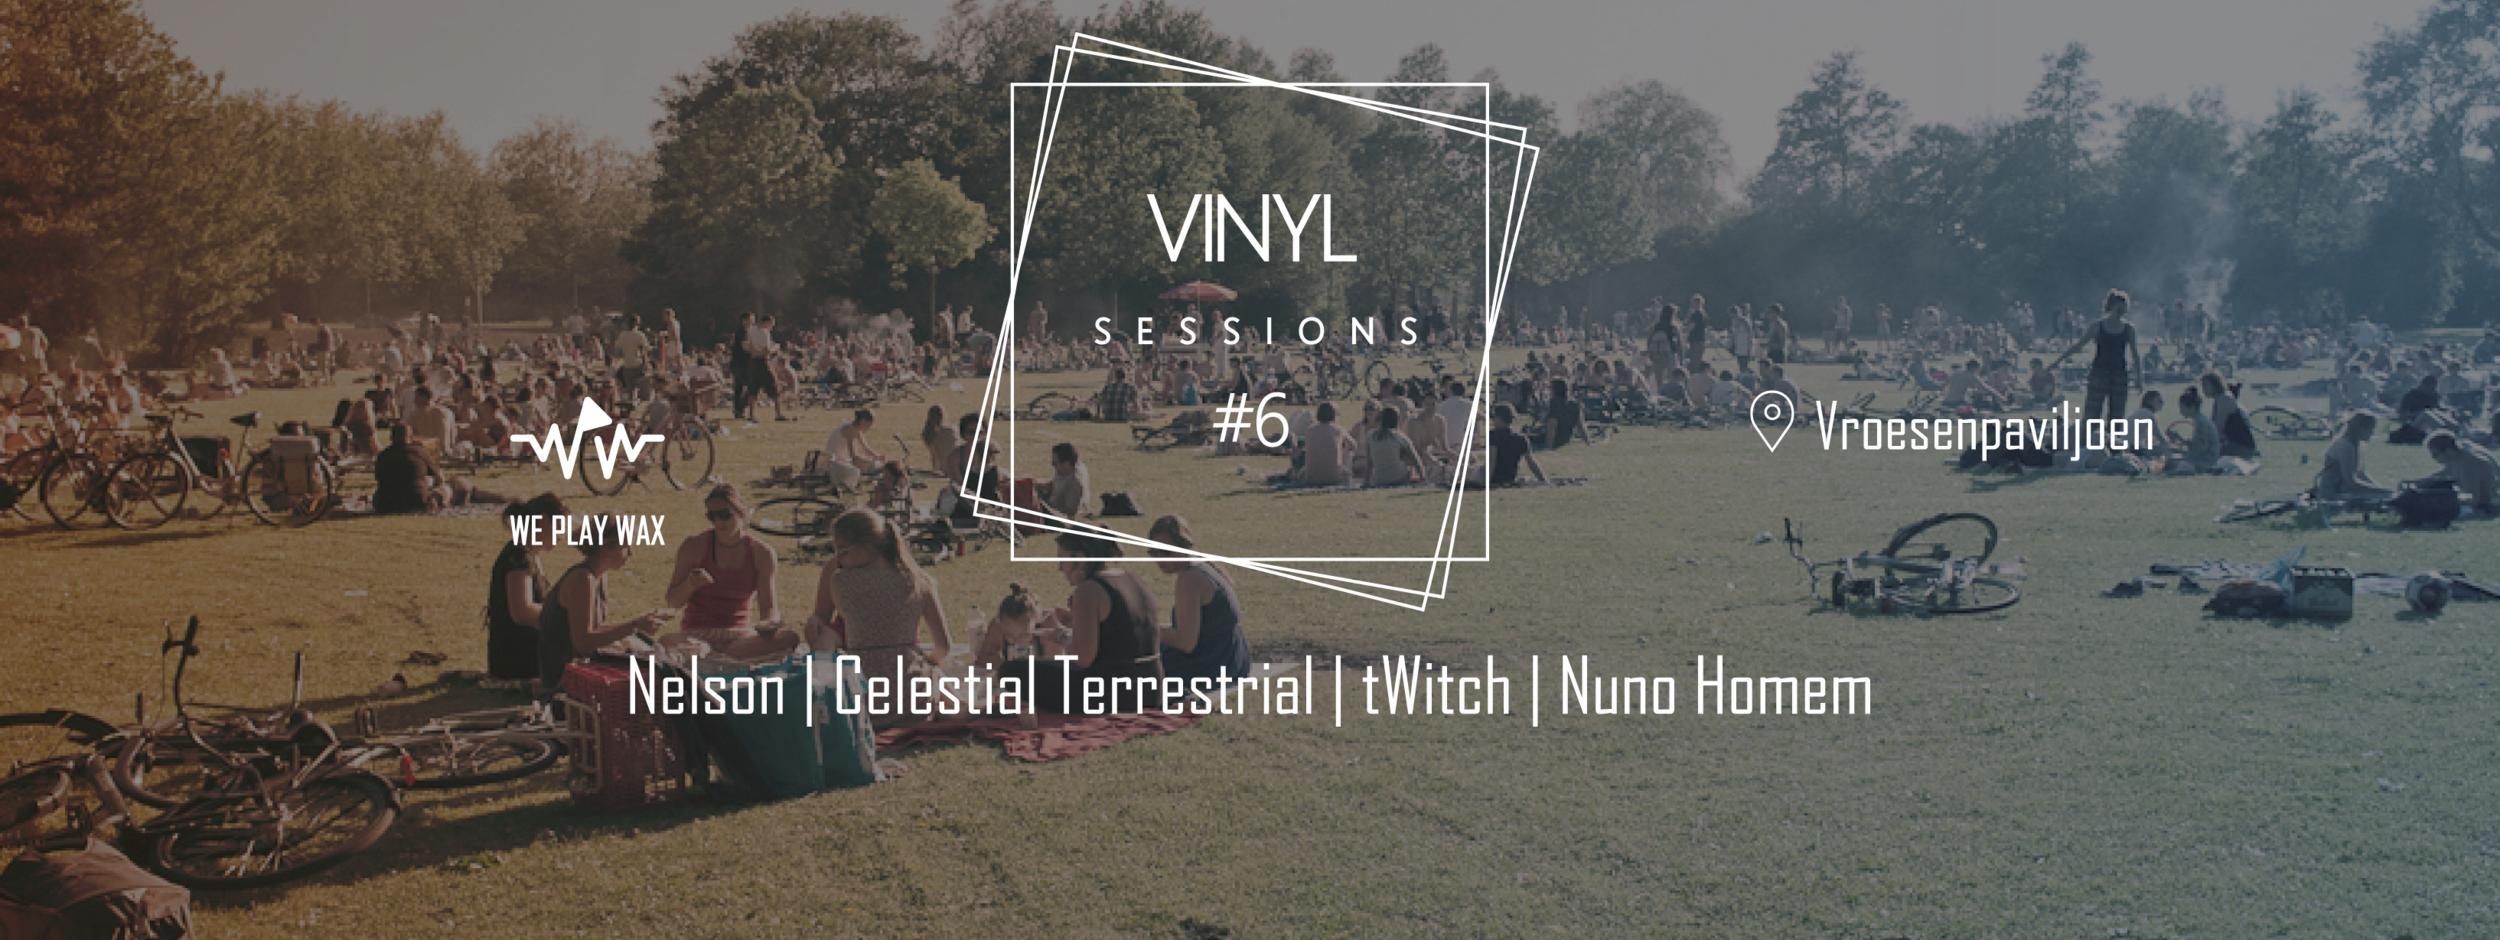 Vinyl Sessions #06 and Club Von Westen - Vroesenborrel